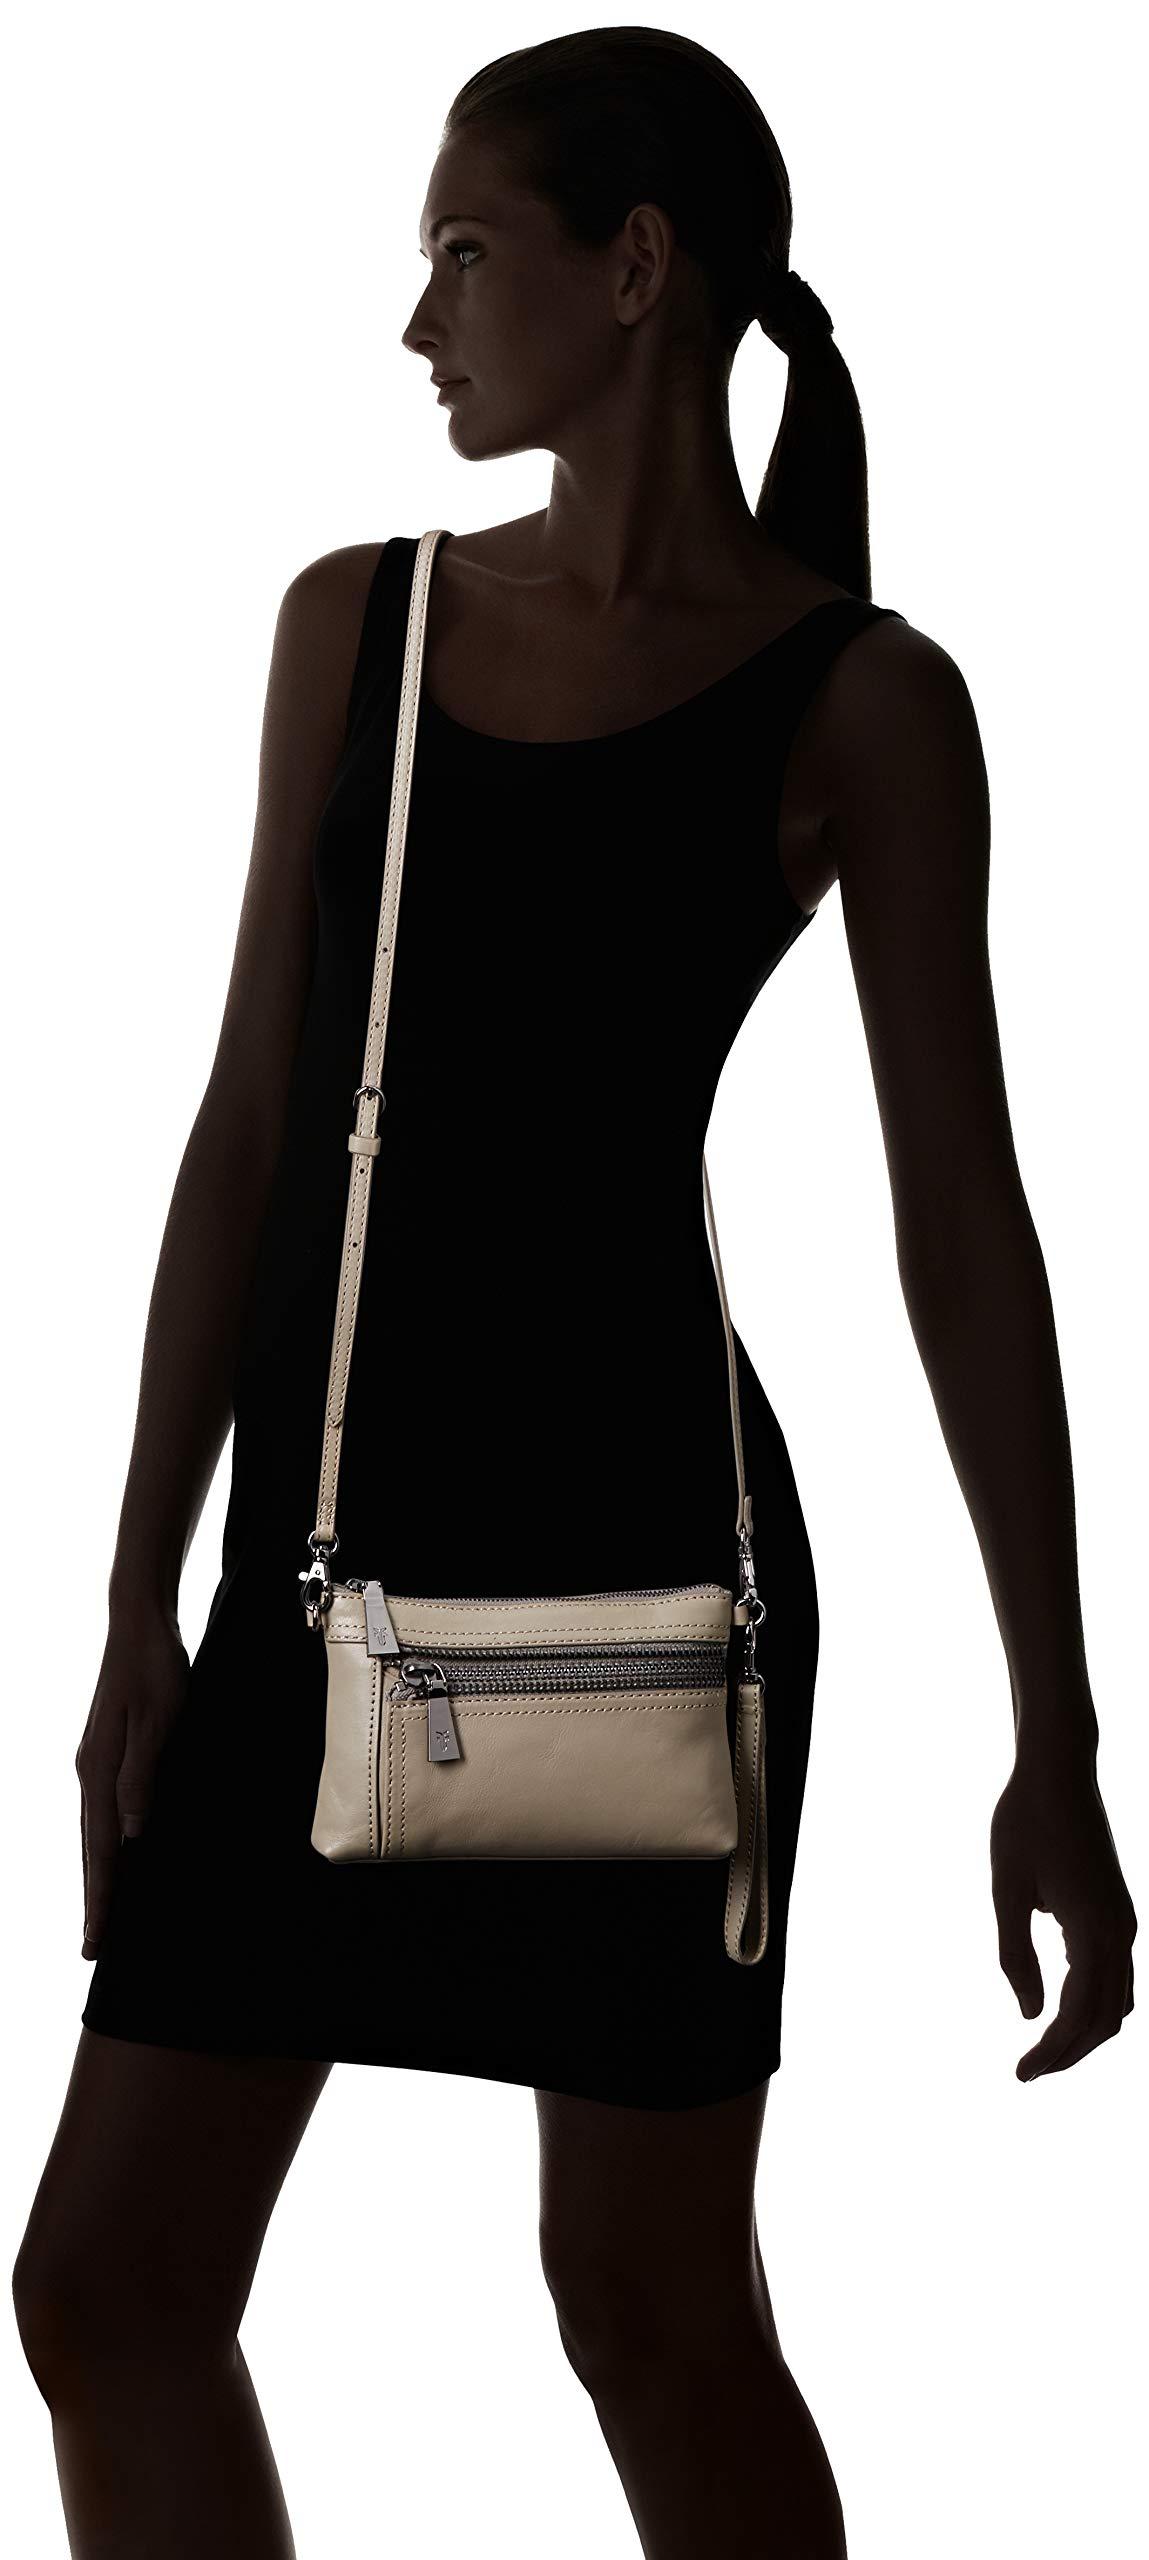 FRYE Lena Zip Leather Crossbody Wristlet Bag, grey by FRYE (Image #7)